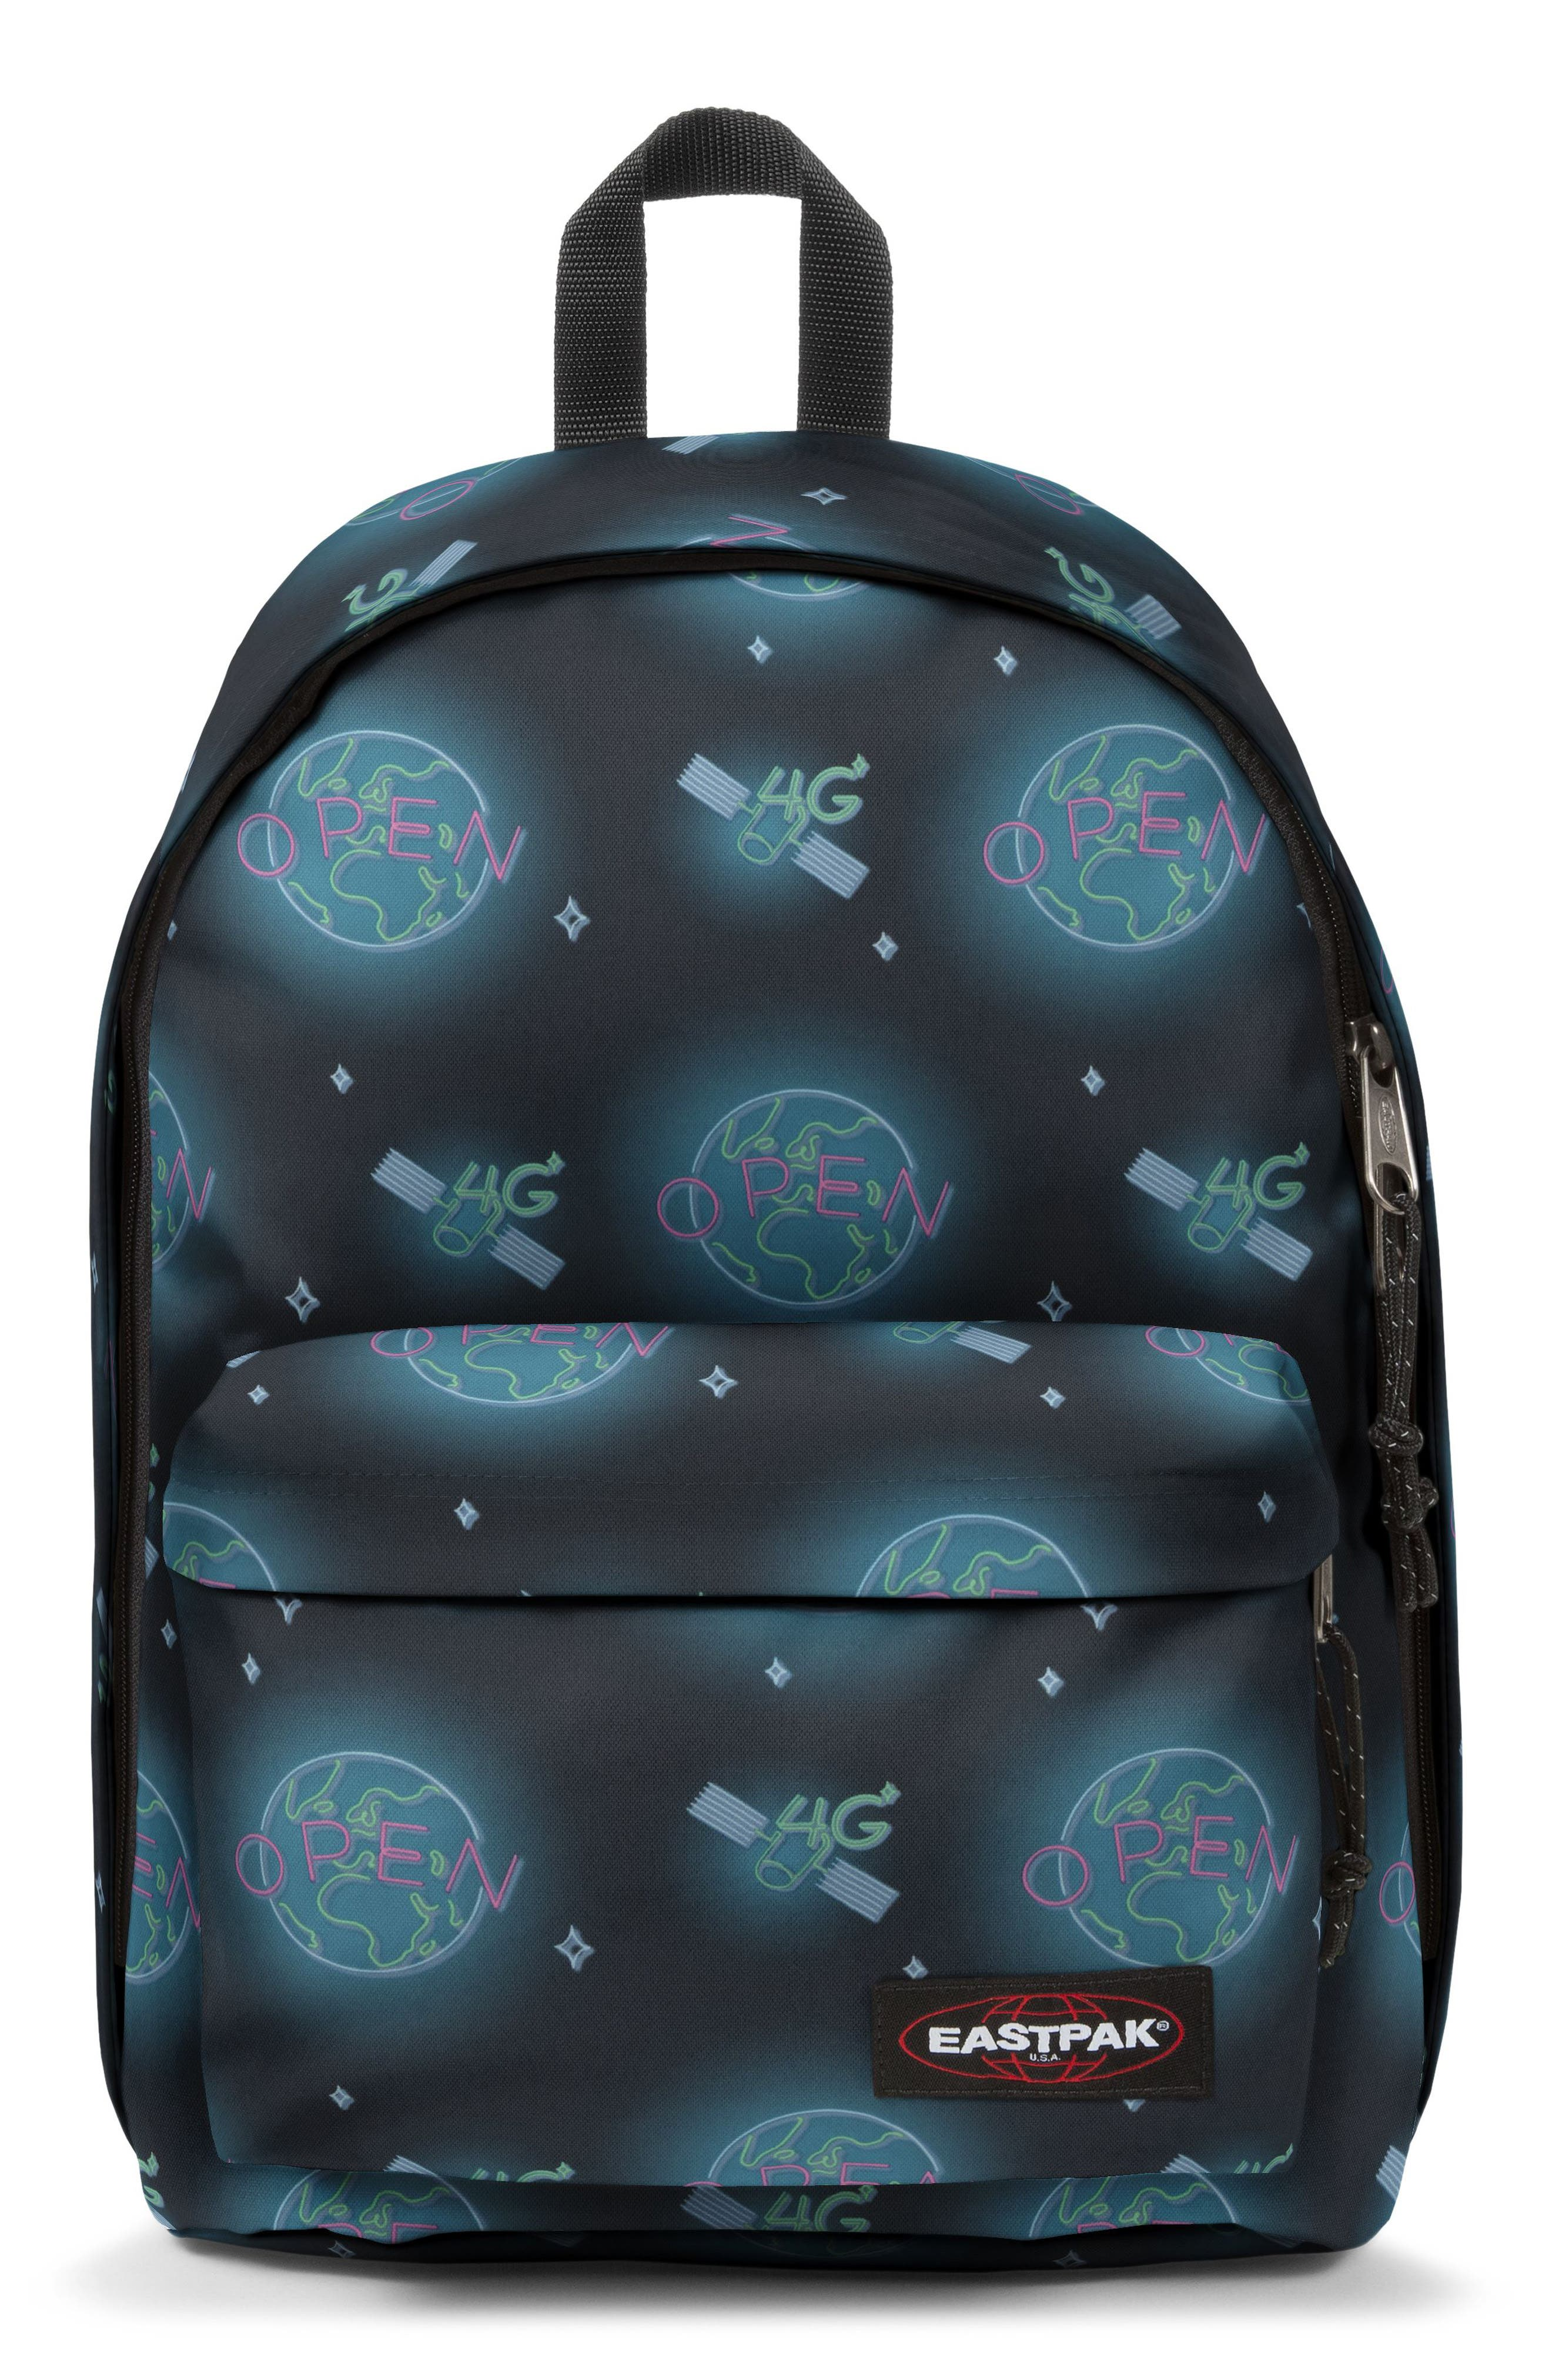 Eastpak Out Of Office Nylon Backpack - Black